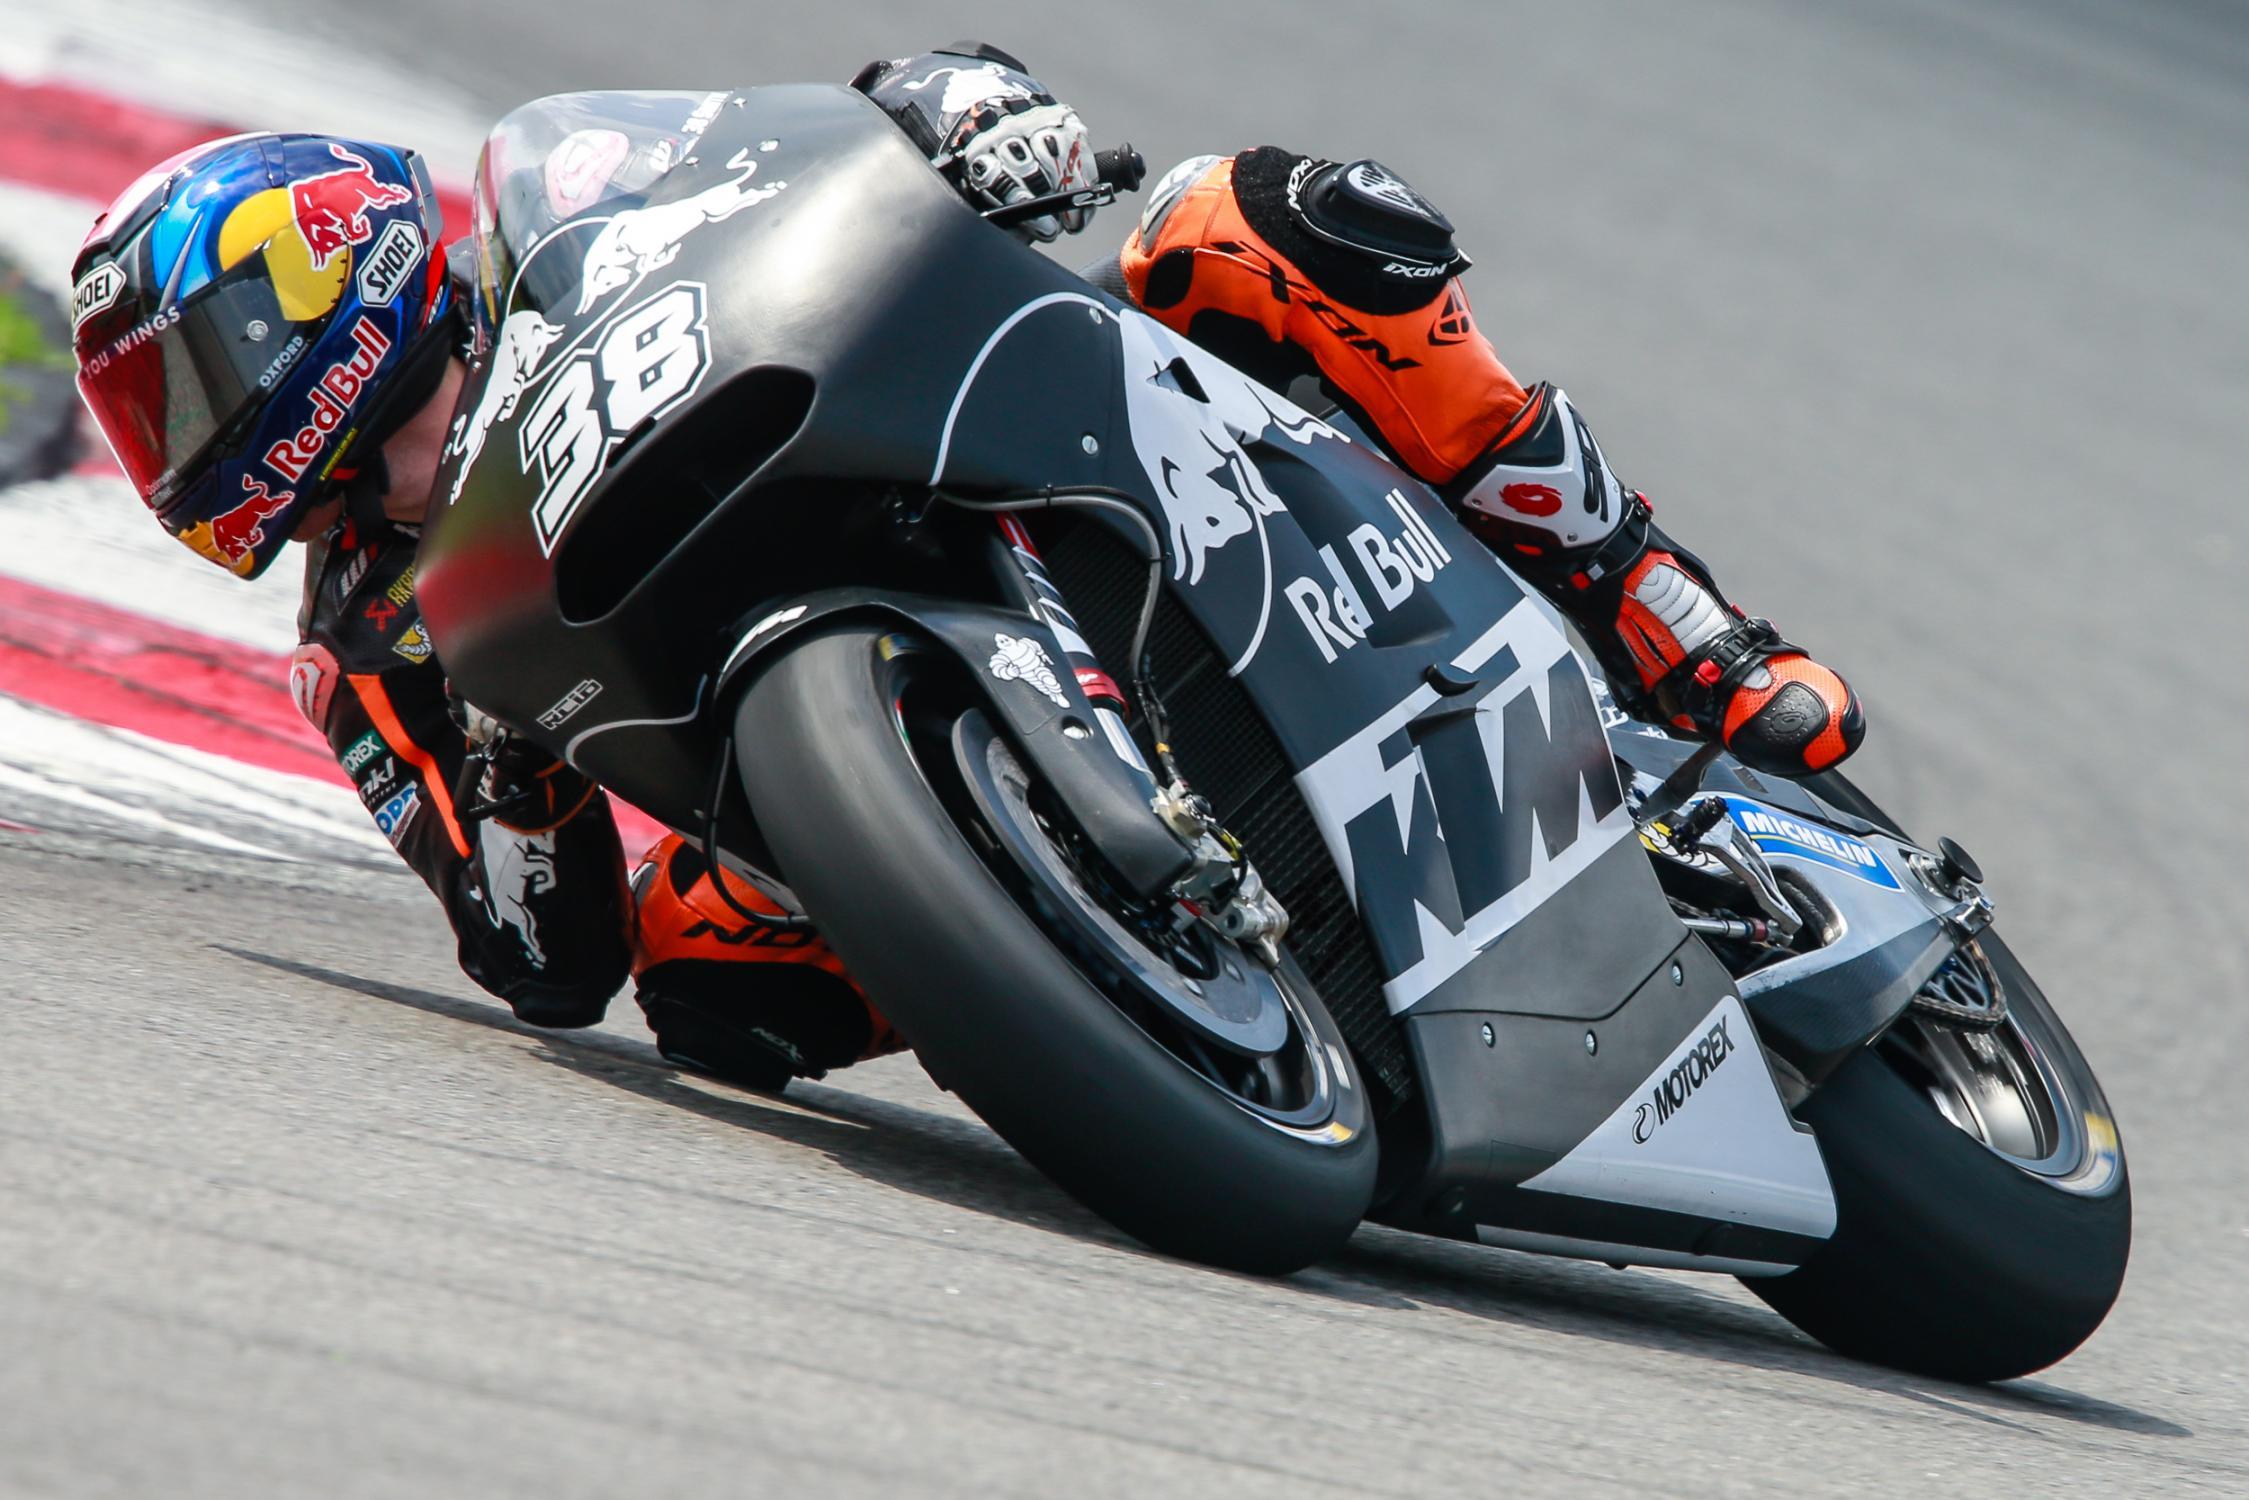 [MotoGP] Test Sepang 38-bradley-smith-eng_gp_7702.gallery_full_top_fullscreen